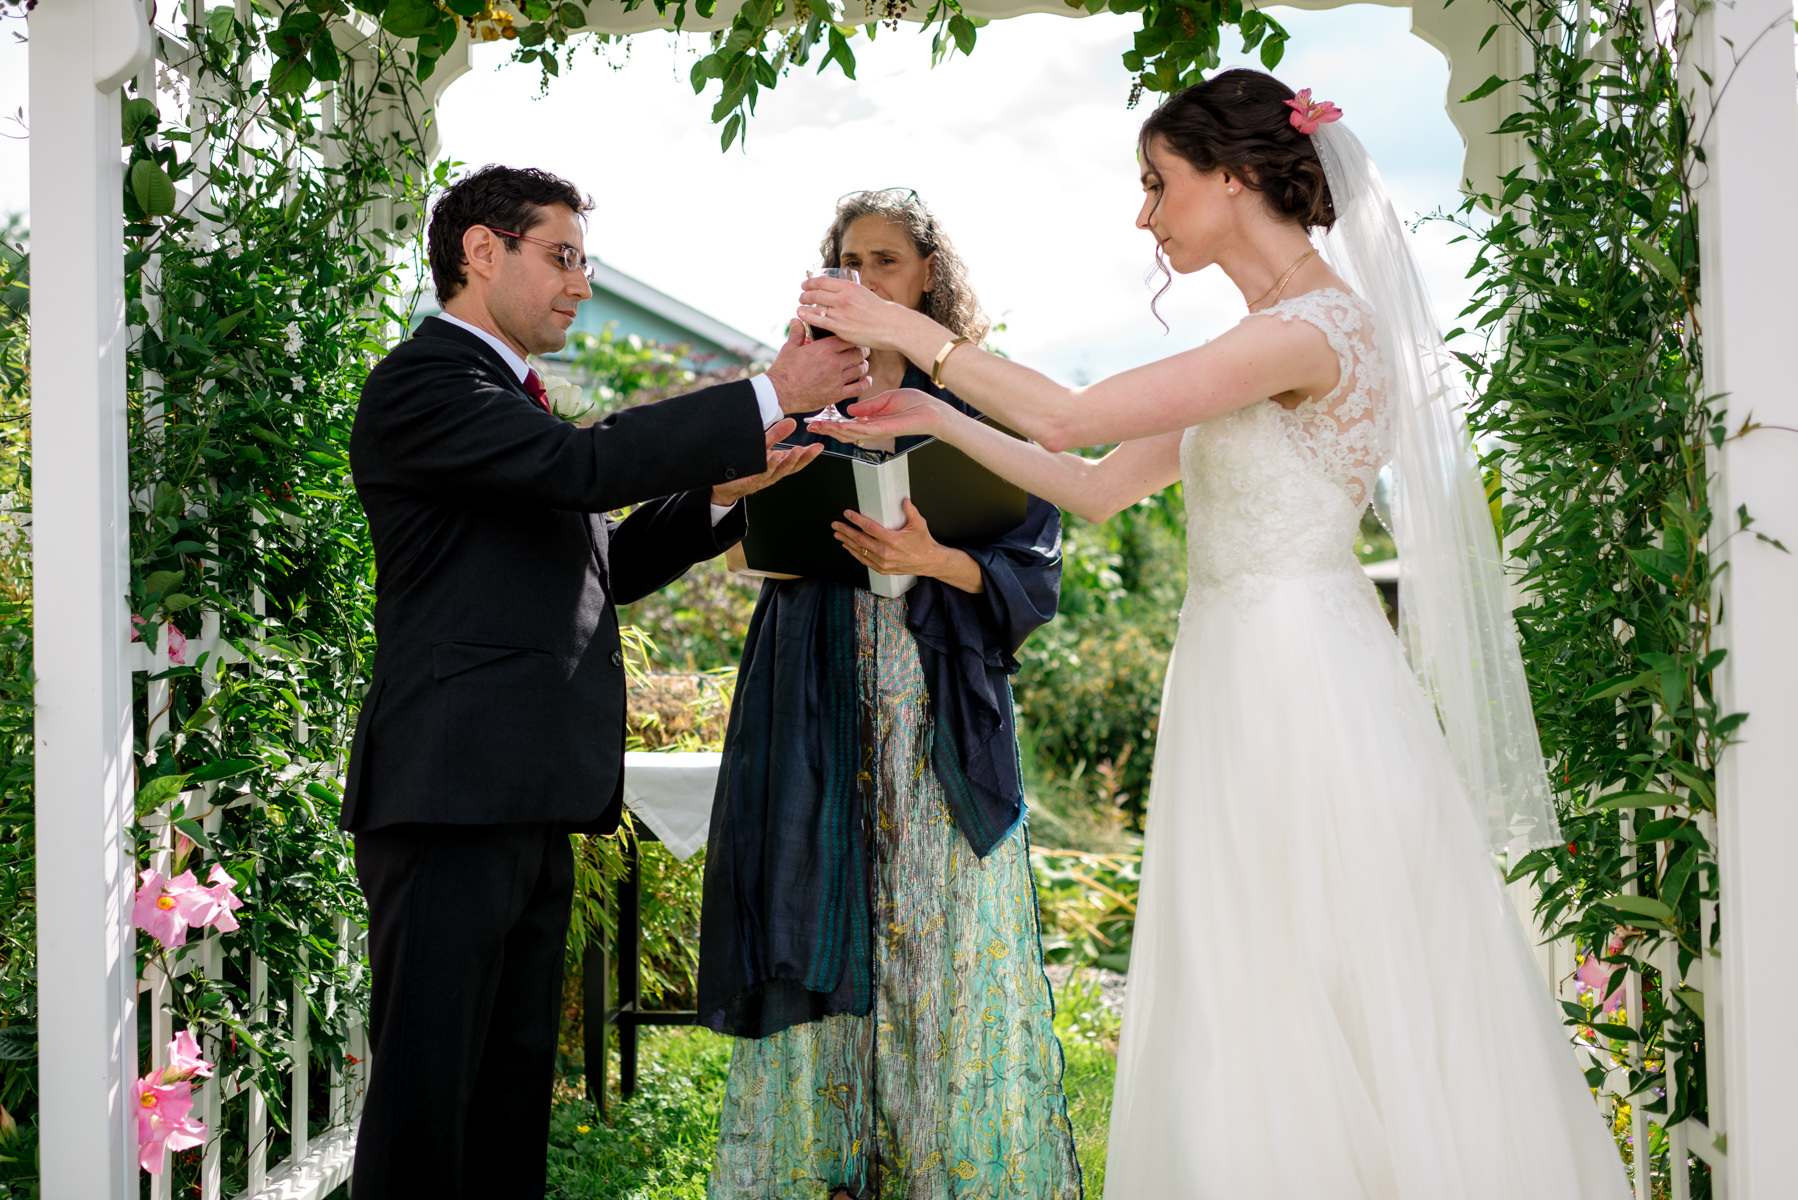 Andrew Tat - Documentary Wedding Photography - Kirkland, Washington - Emily & Cuauh - 09.JPG